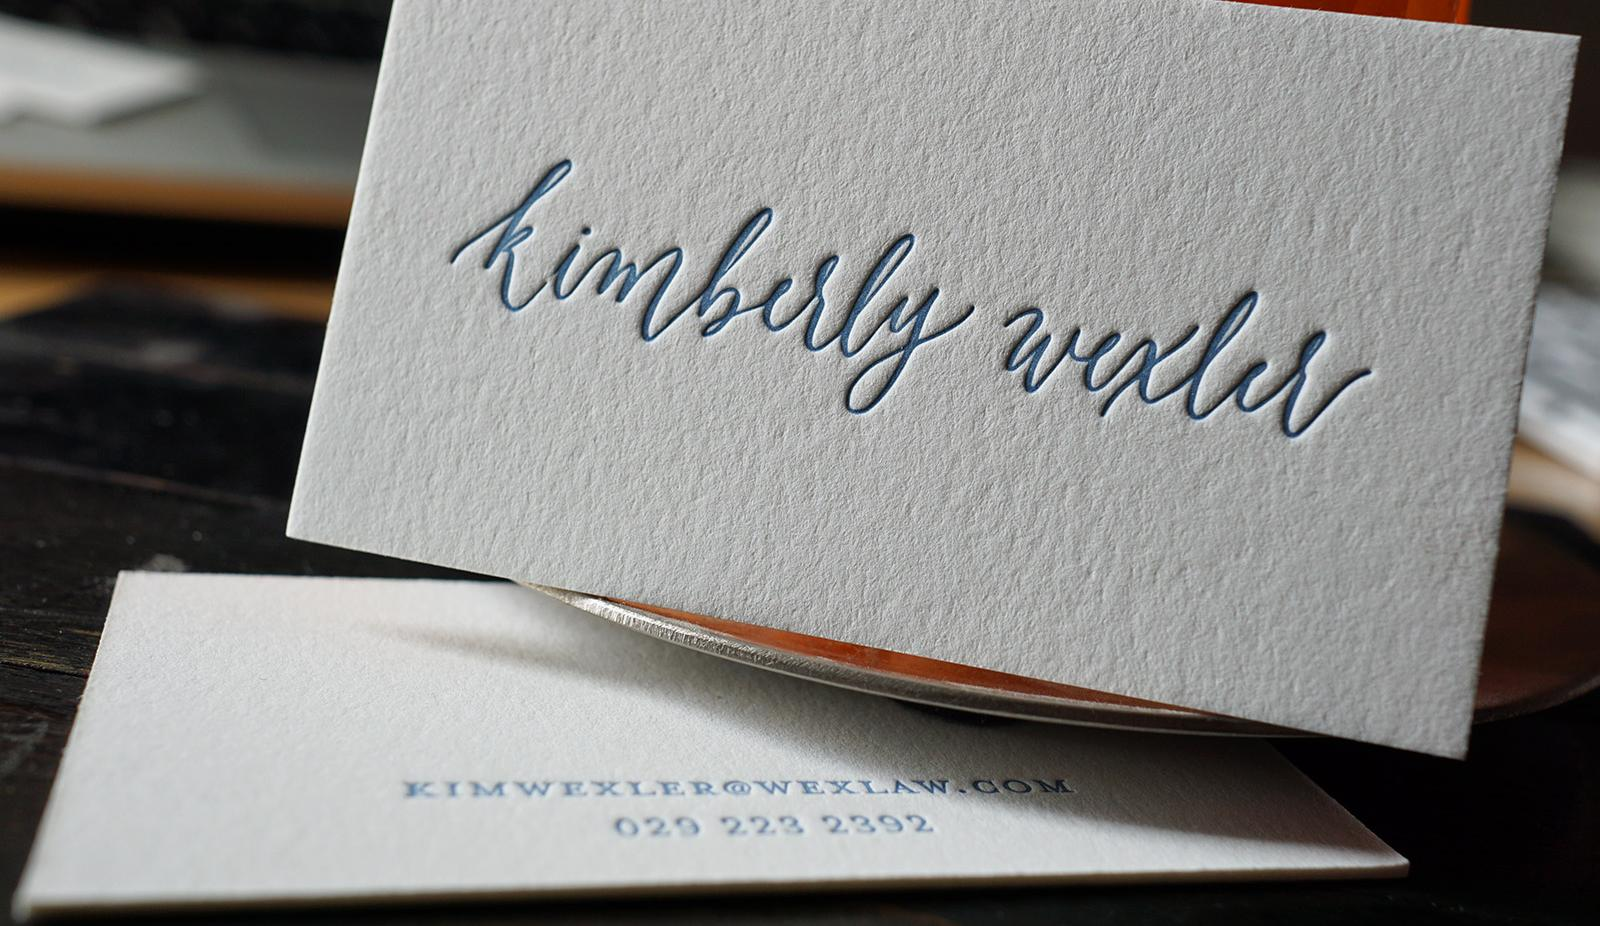 Letterpress business cards business card tips letterpress business cards reheart Images